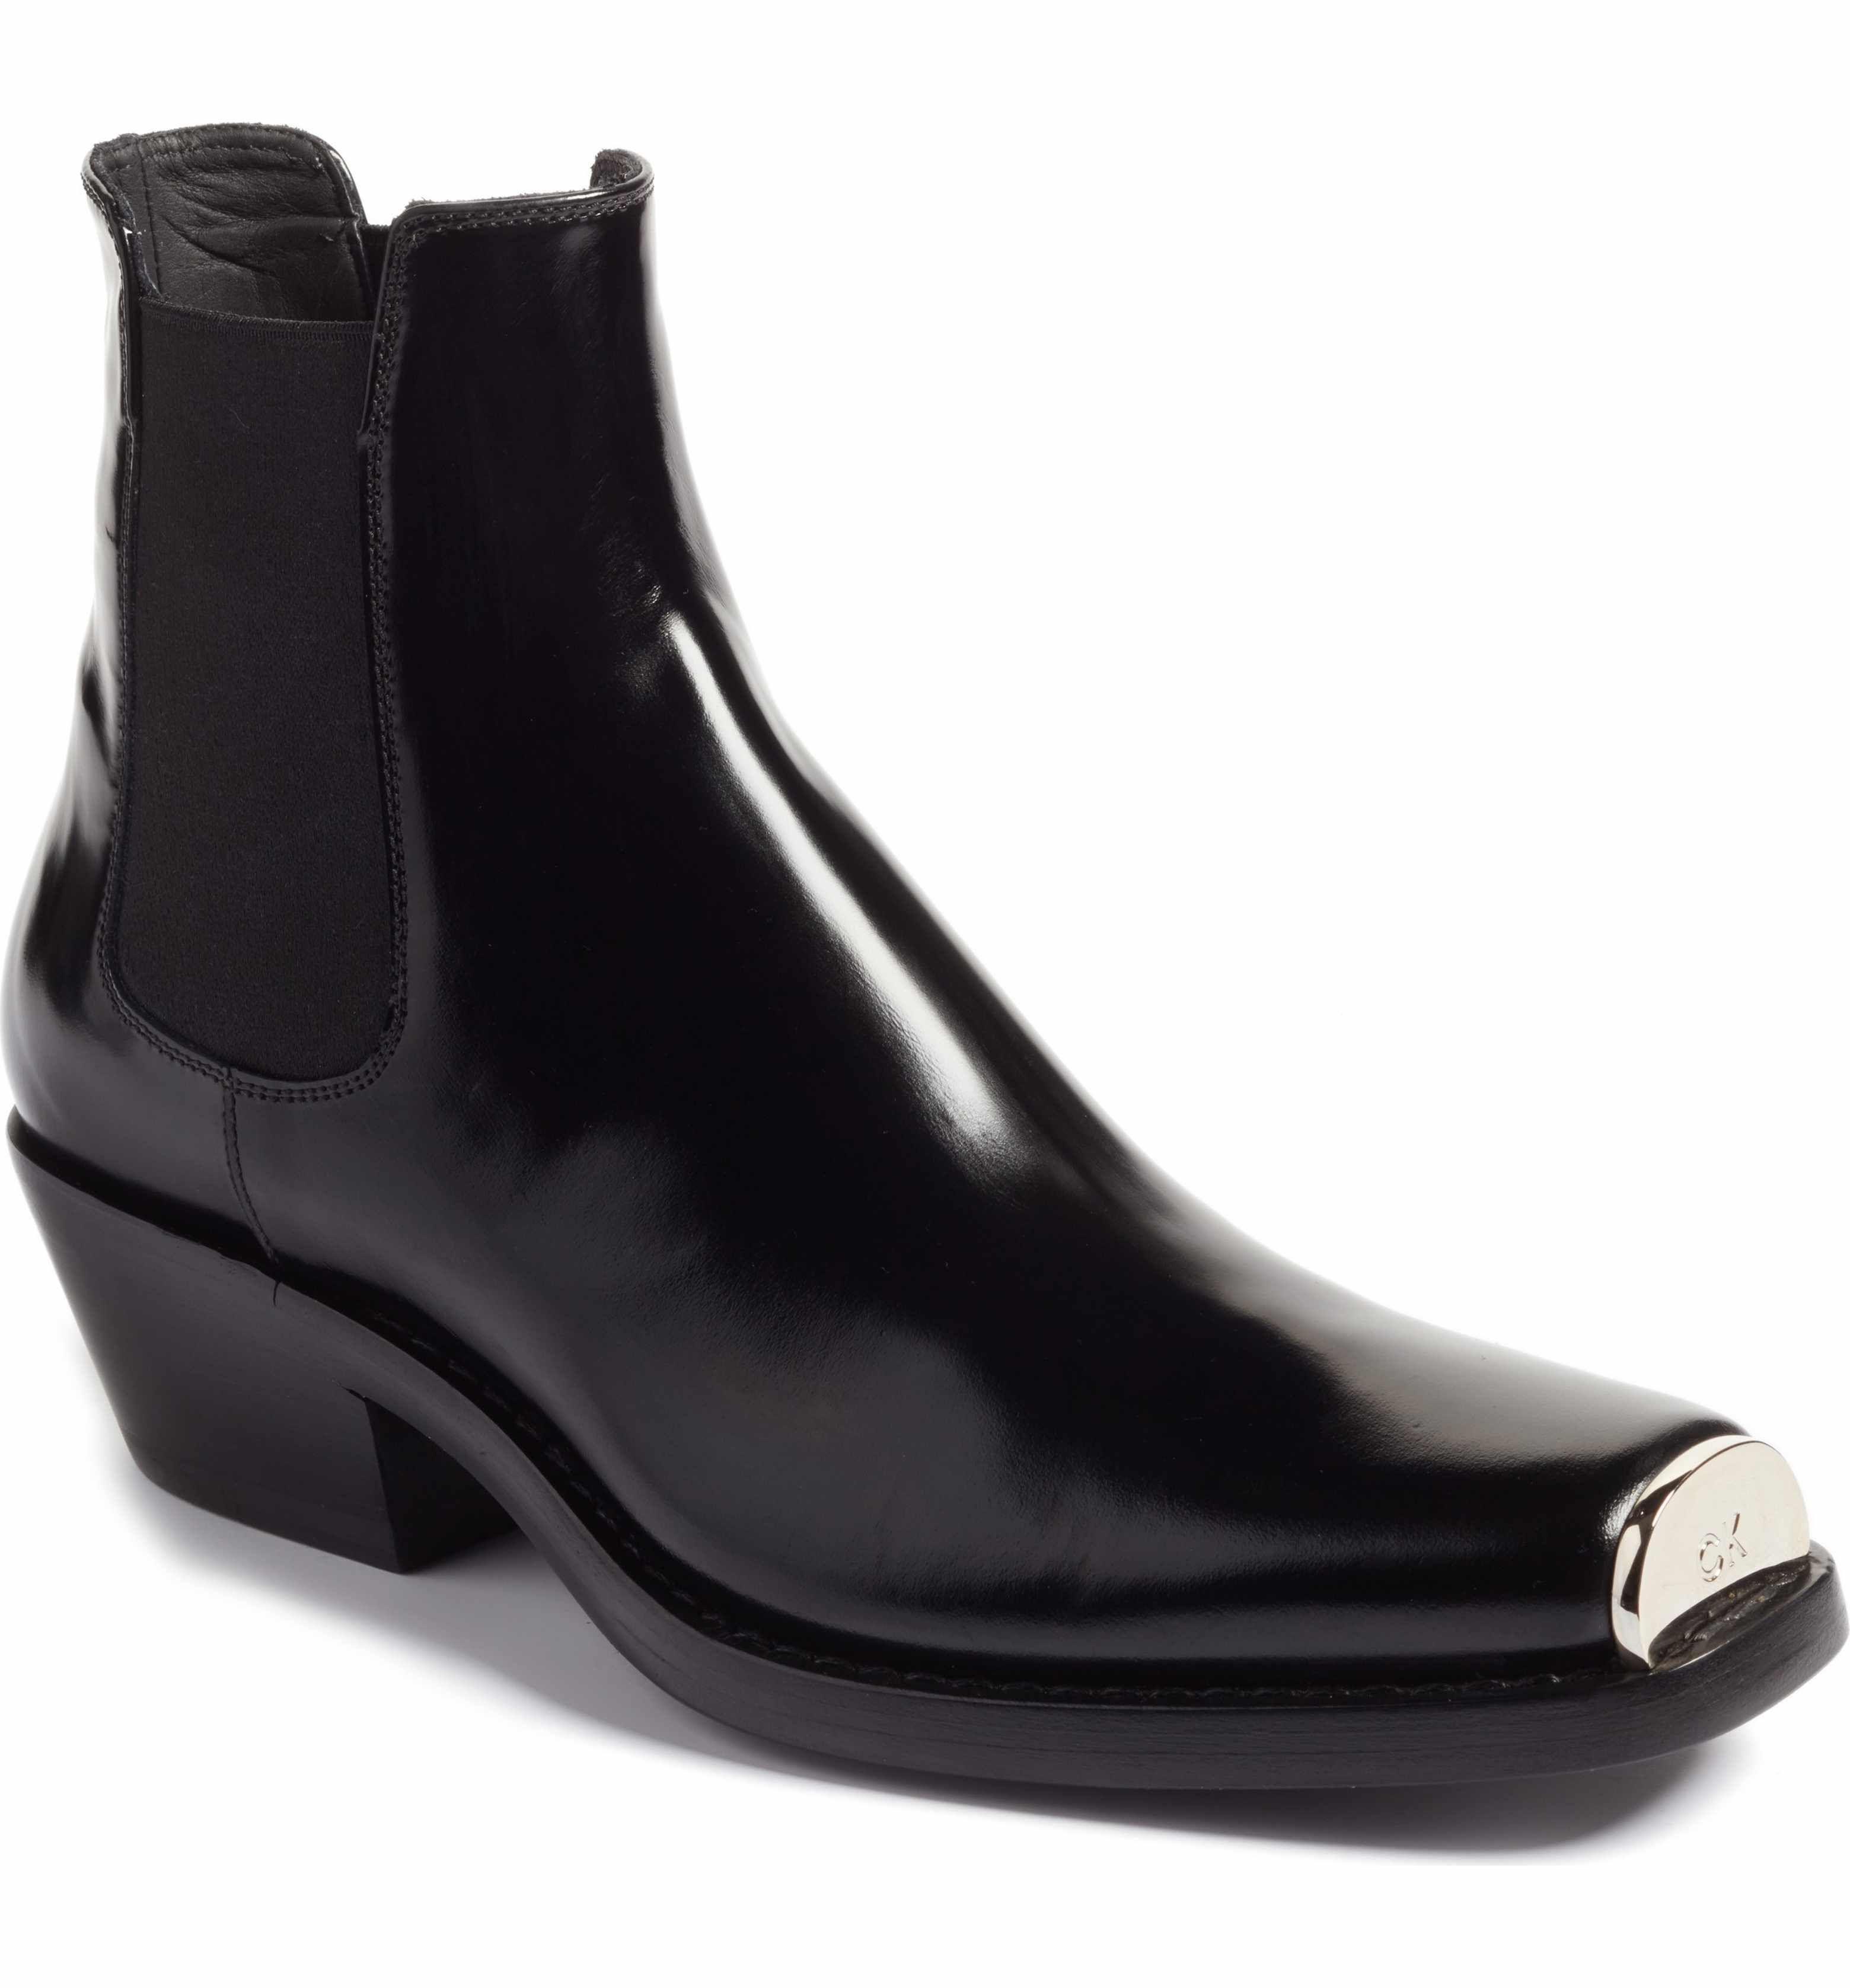 calvin klein chelsea boots